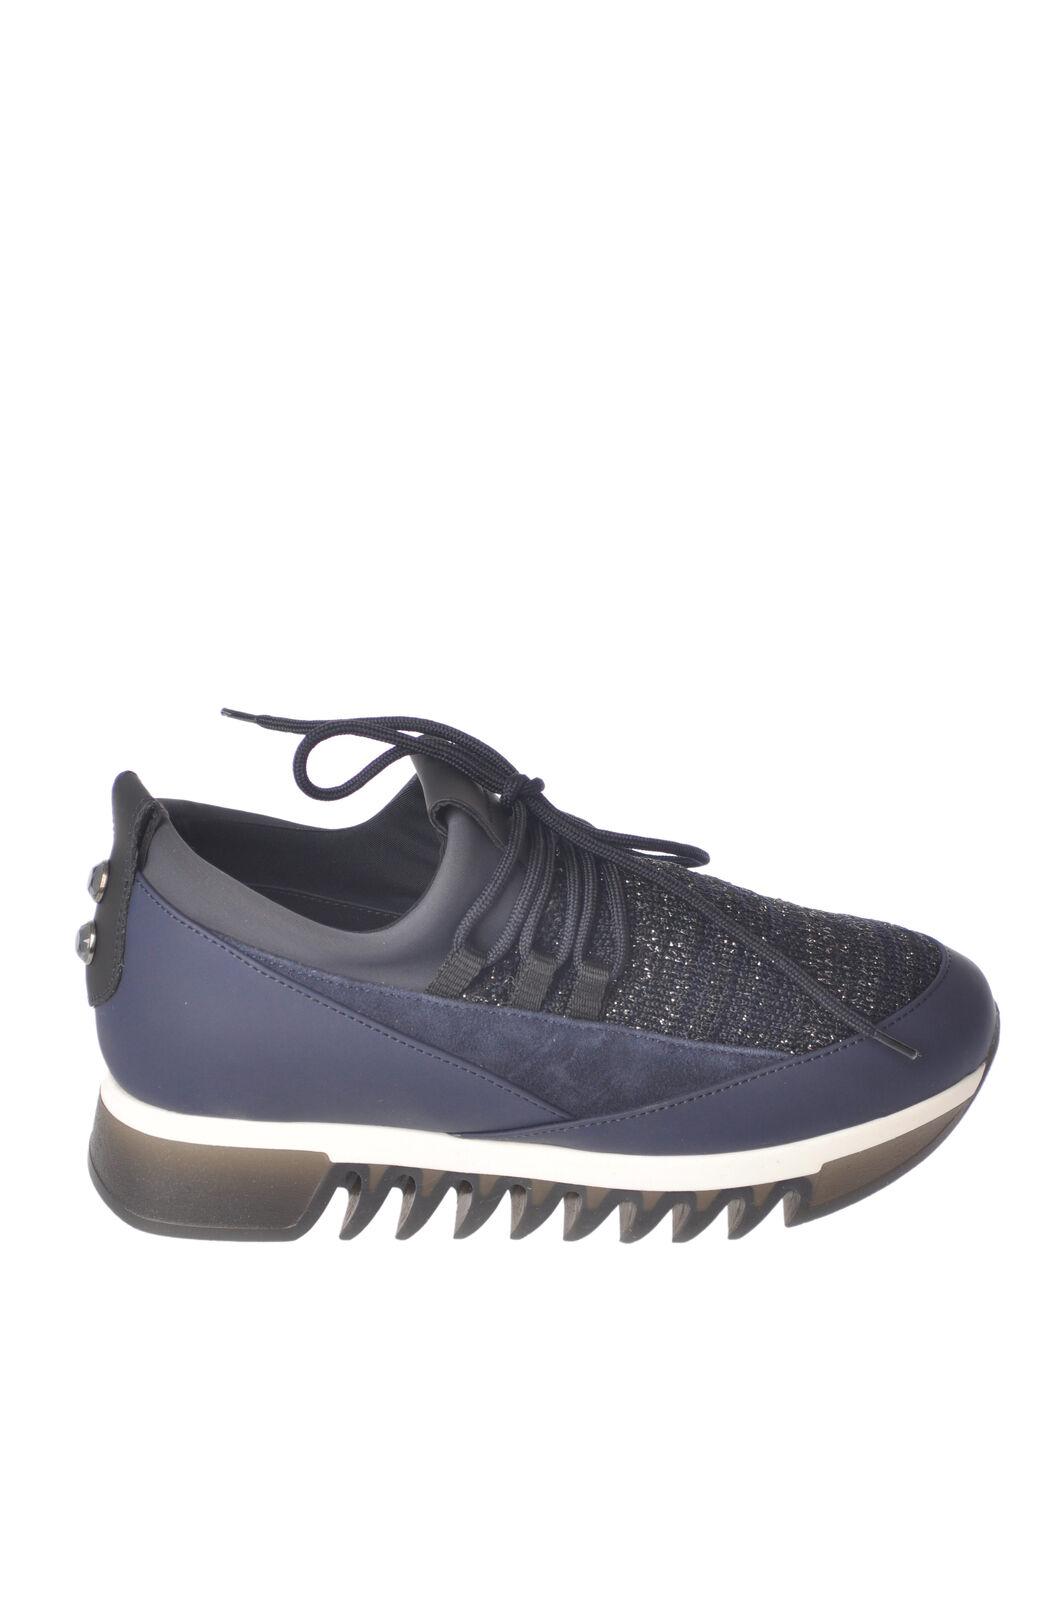 Alexander Smith  -  baskets - Female - bleu - 4205427A181403